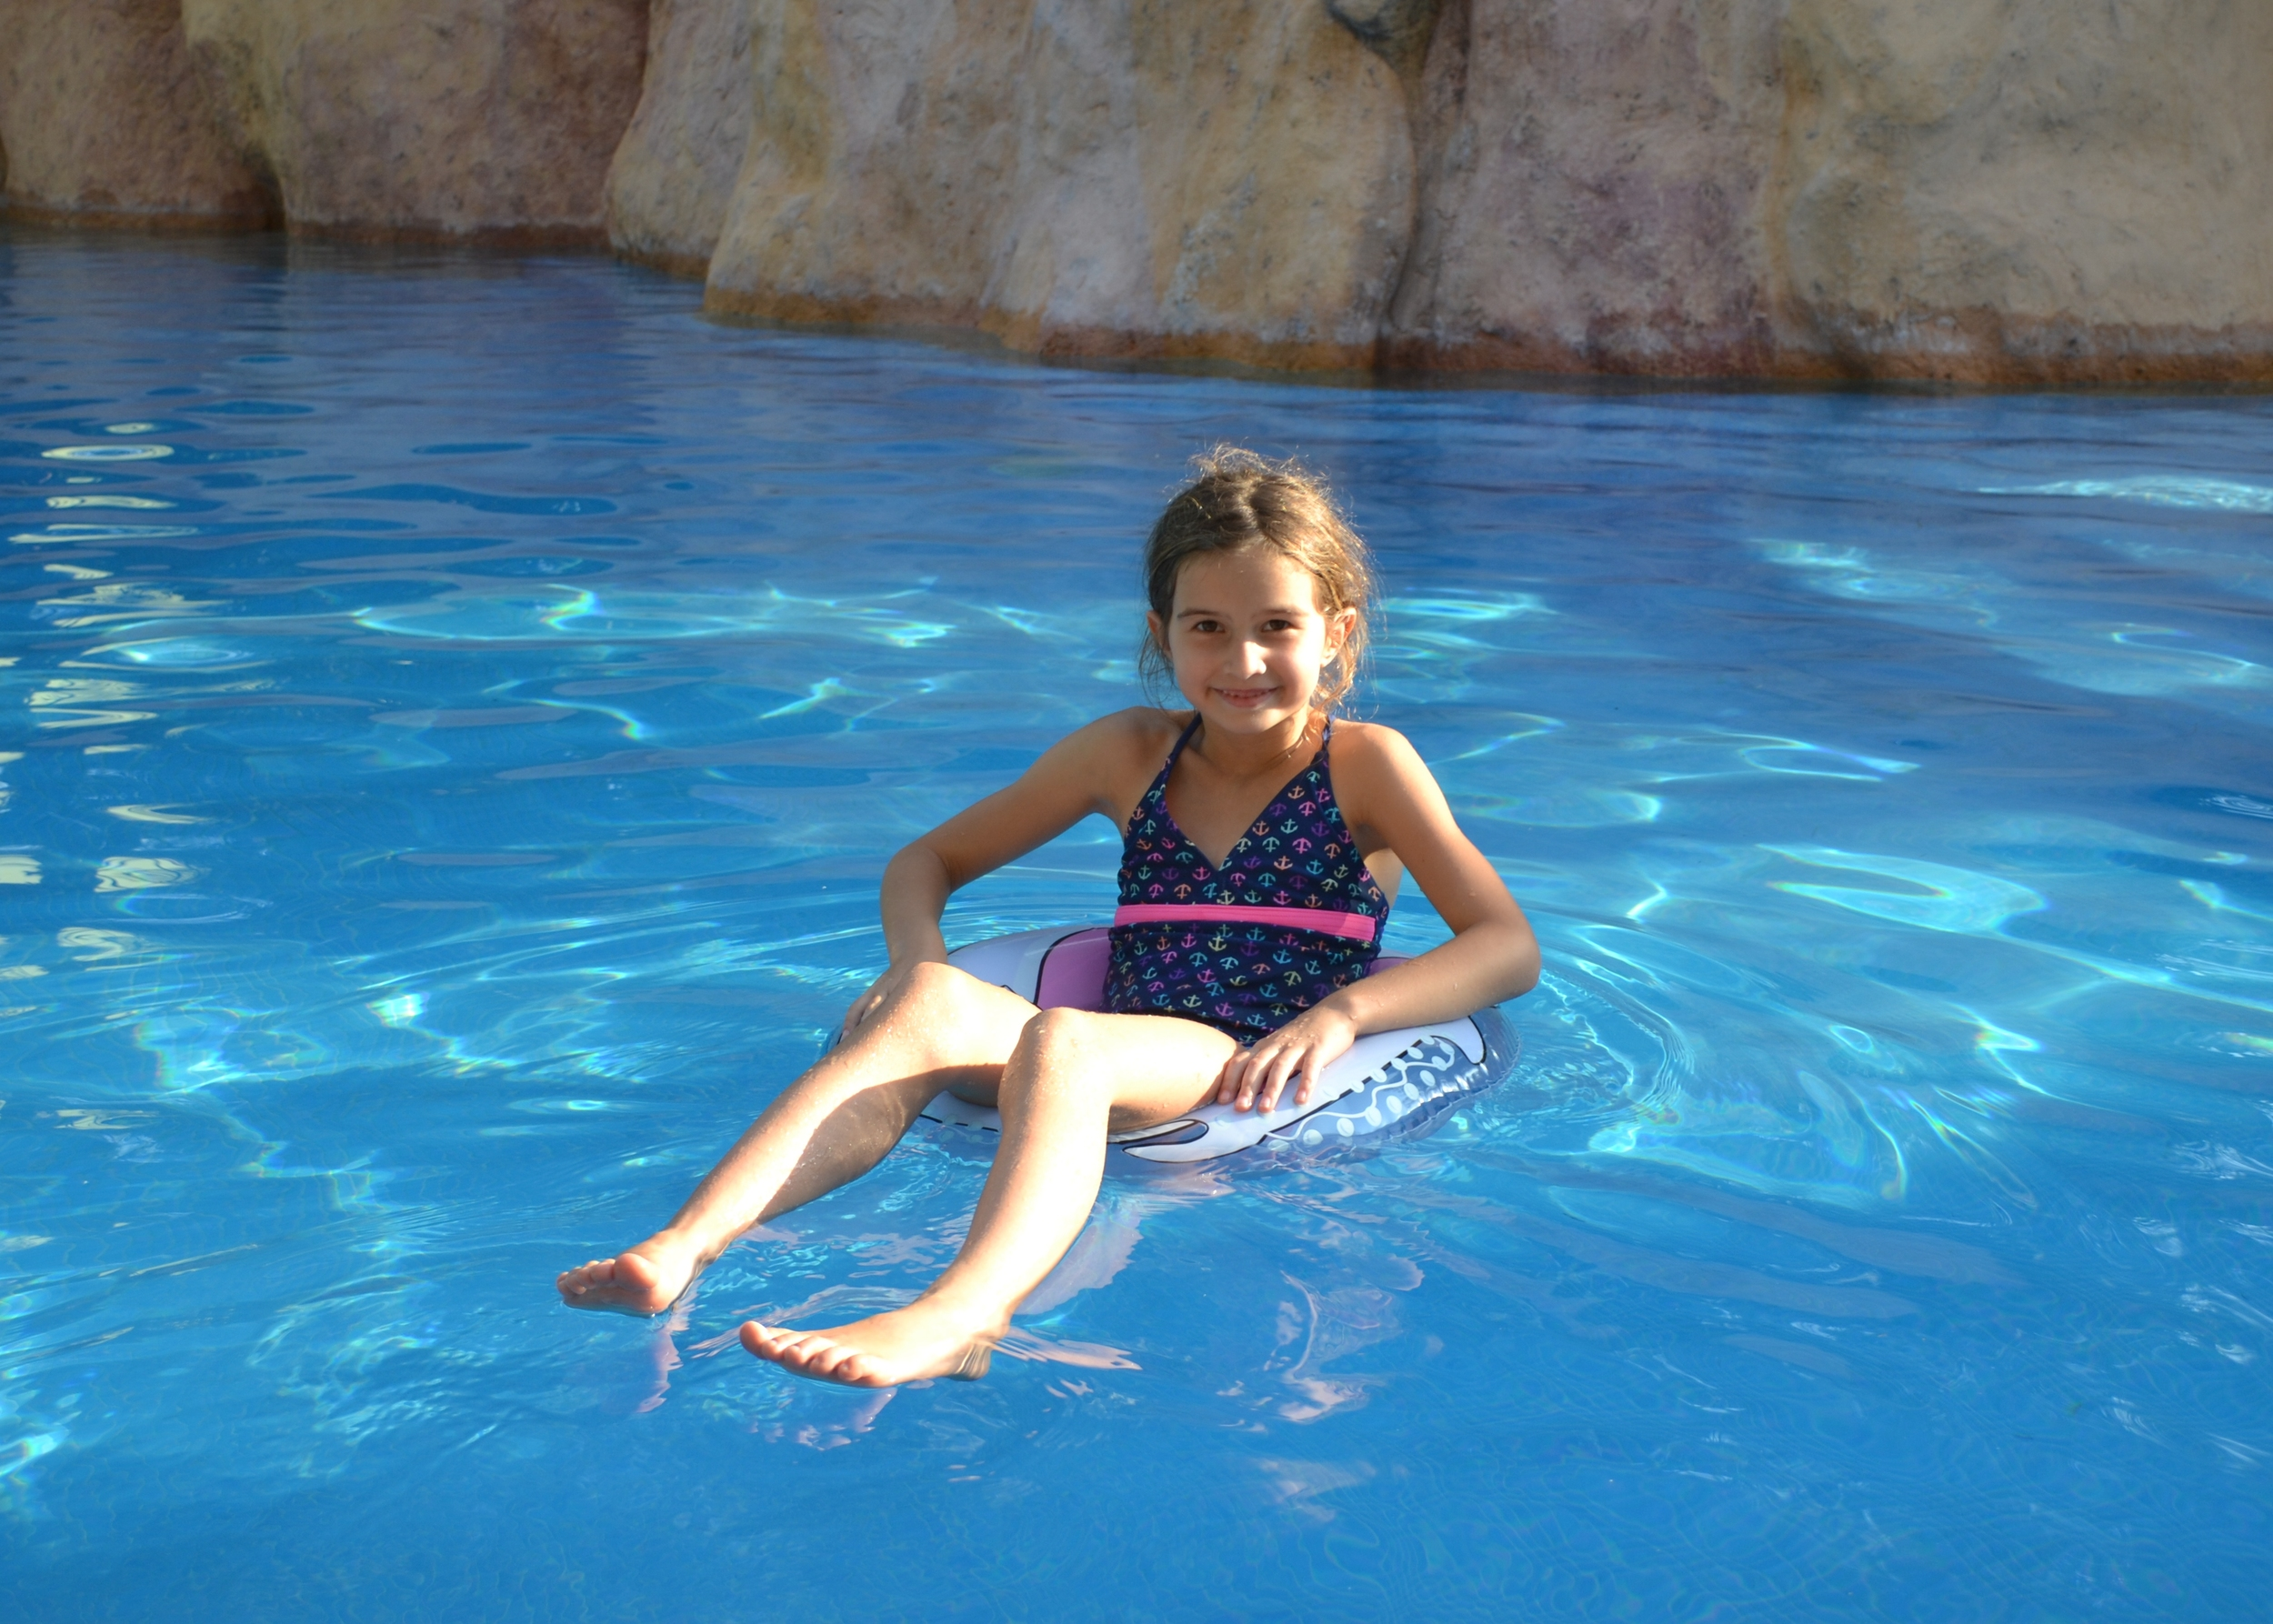 Lili enjoying the pool